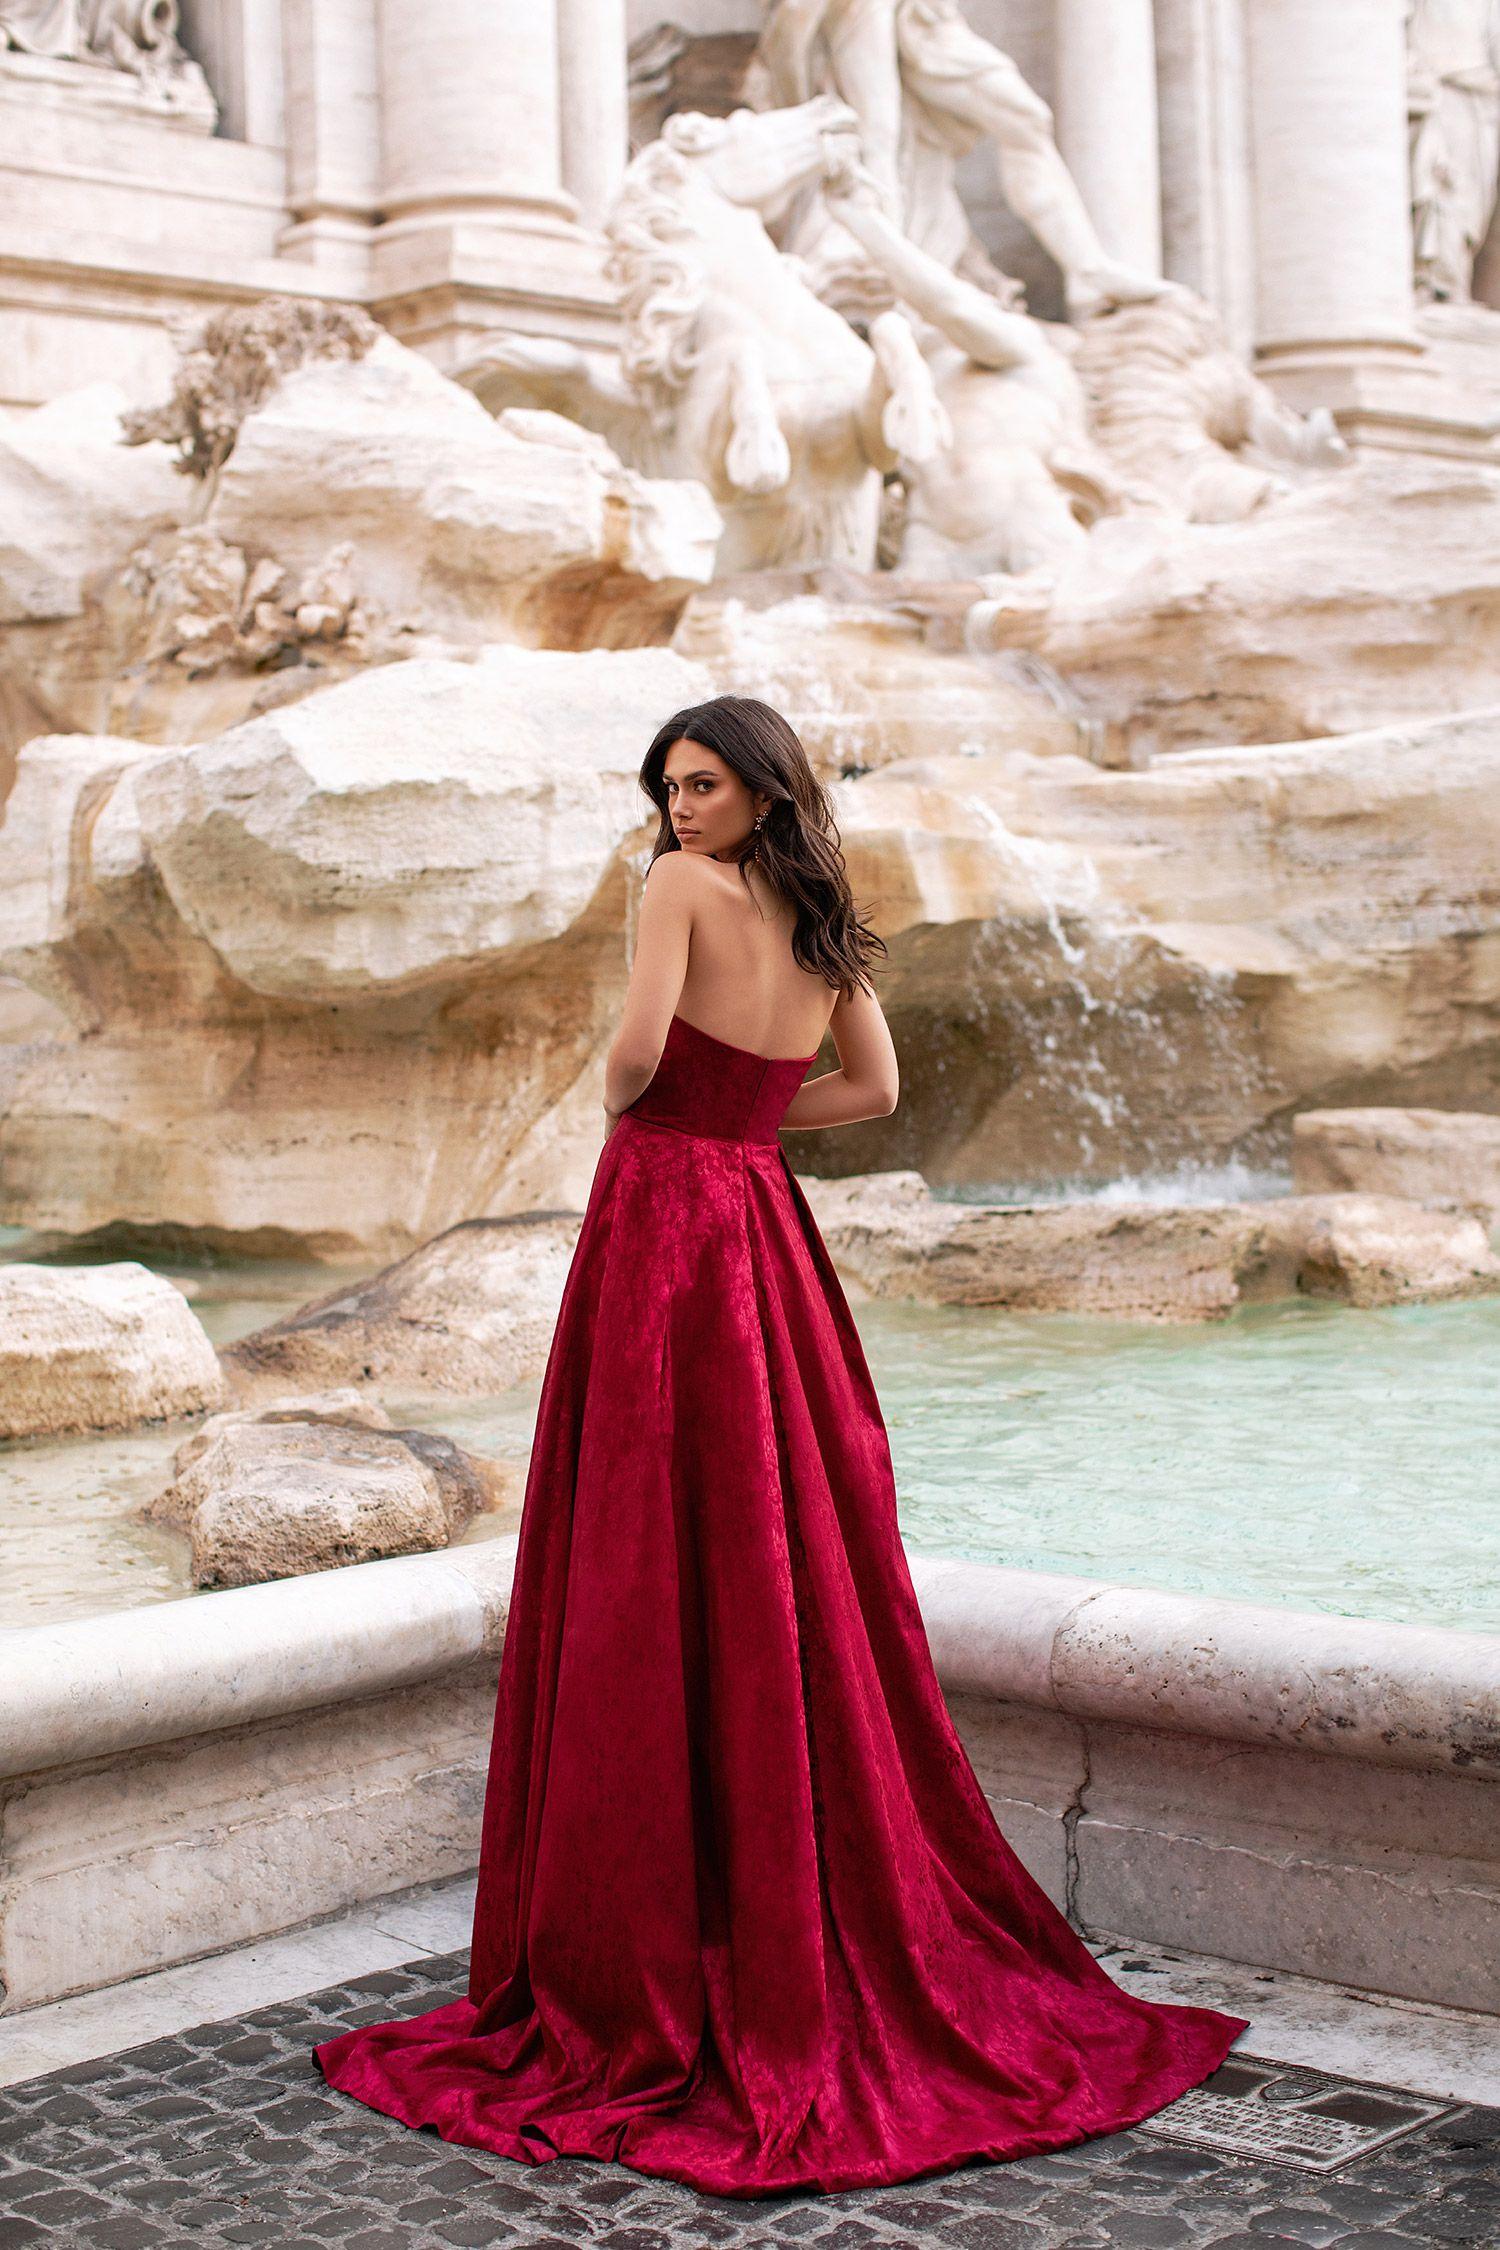 Terina Wine Red In 2020 Dresses Gowns Dresses Designer Dresses